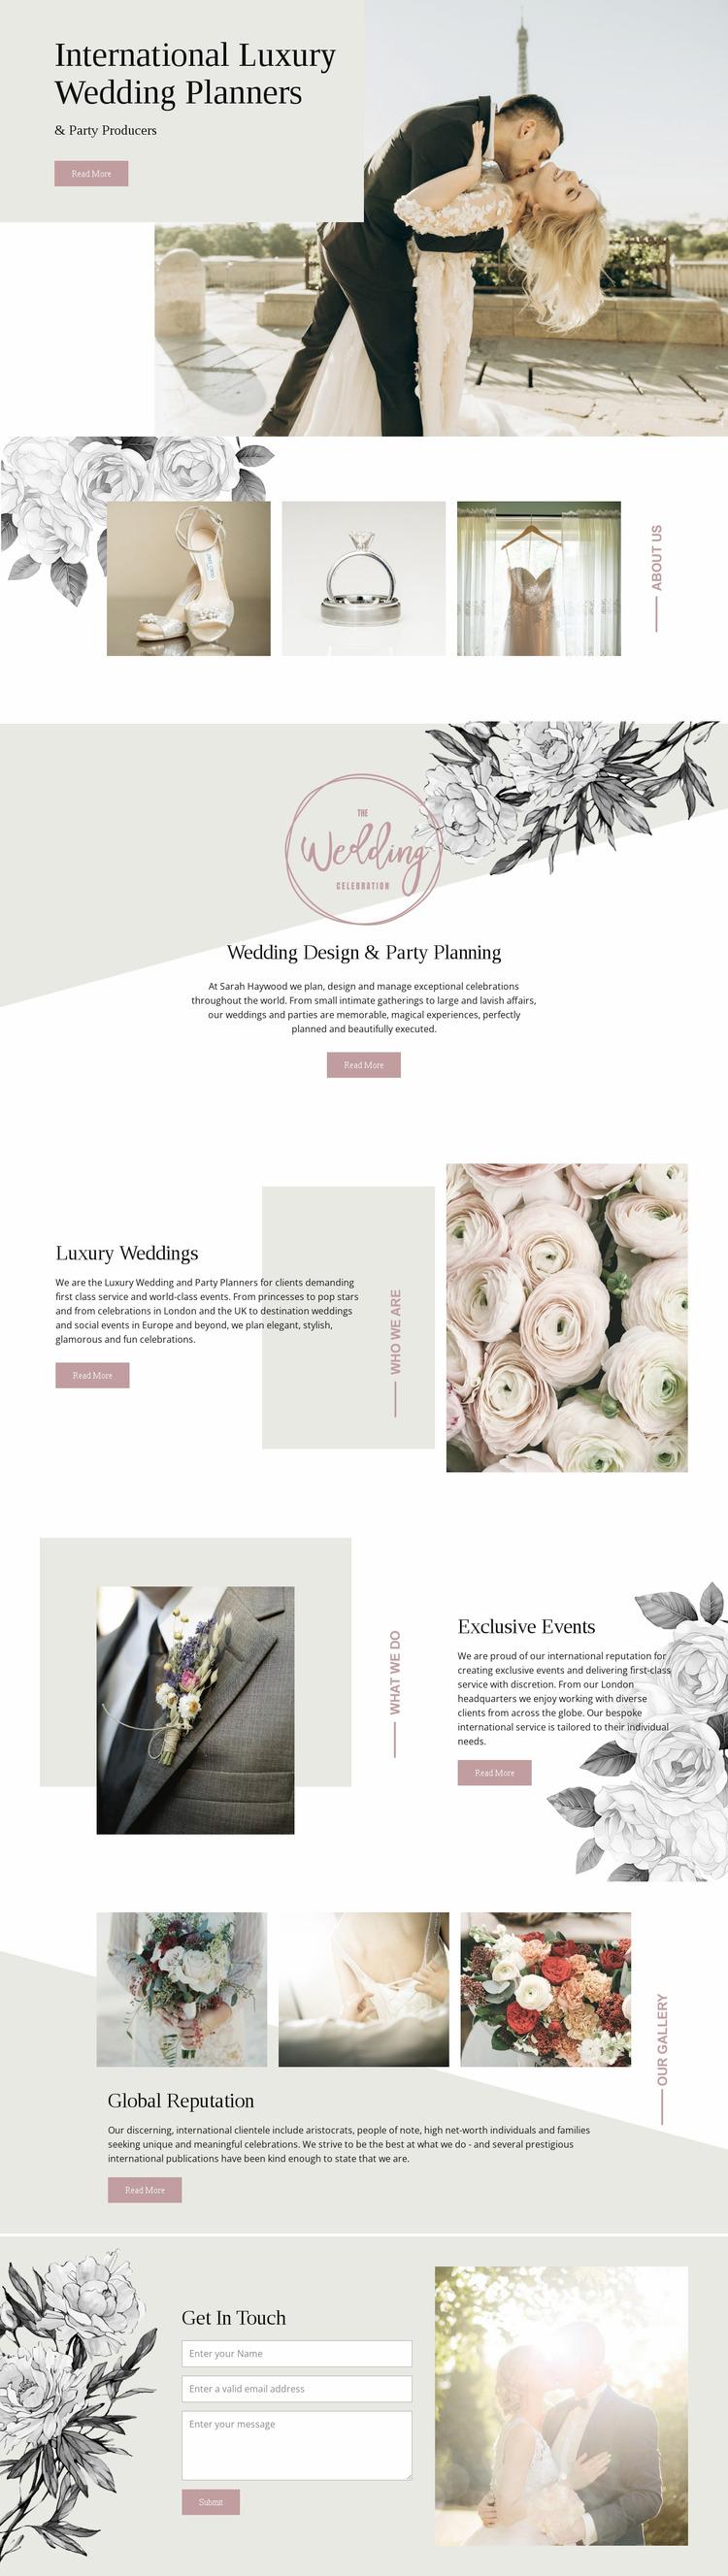 Planners of luxury wedding WordPress Website Builder